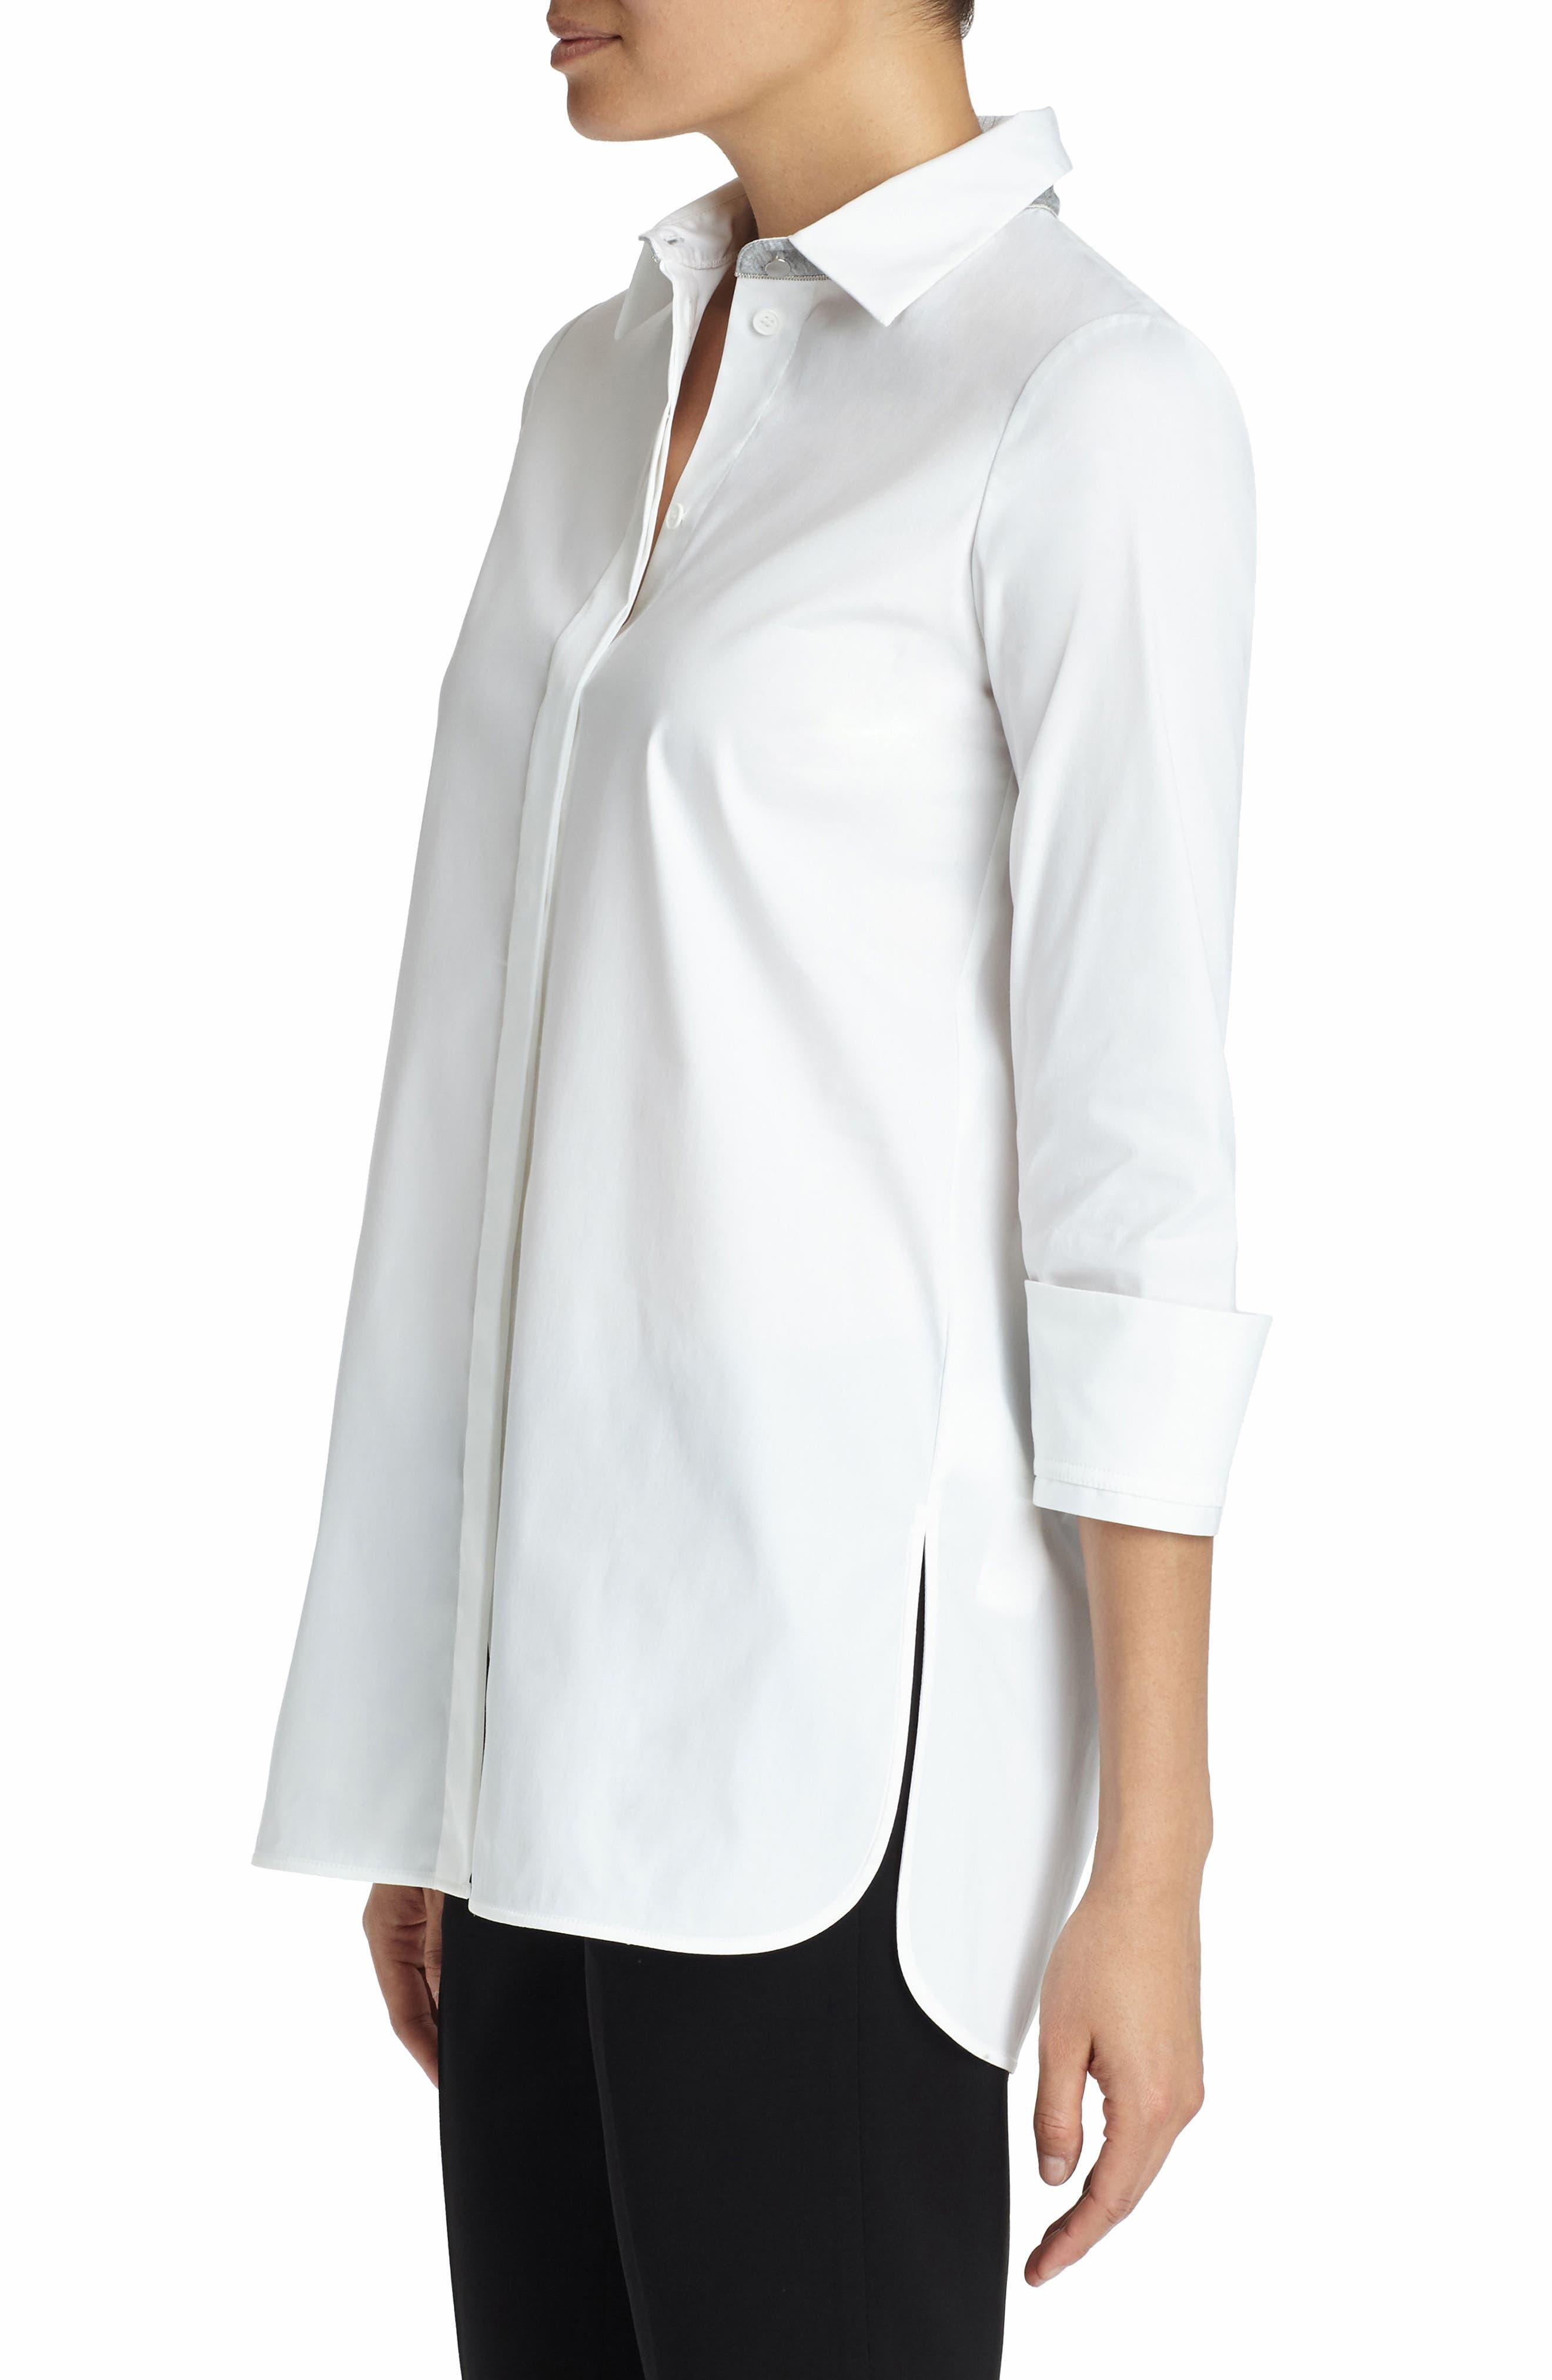 Augusta Stretch Cotton Shirt,                             Alternate thumbnail 4, color,                             White